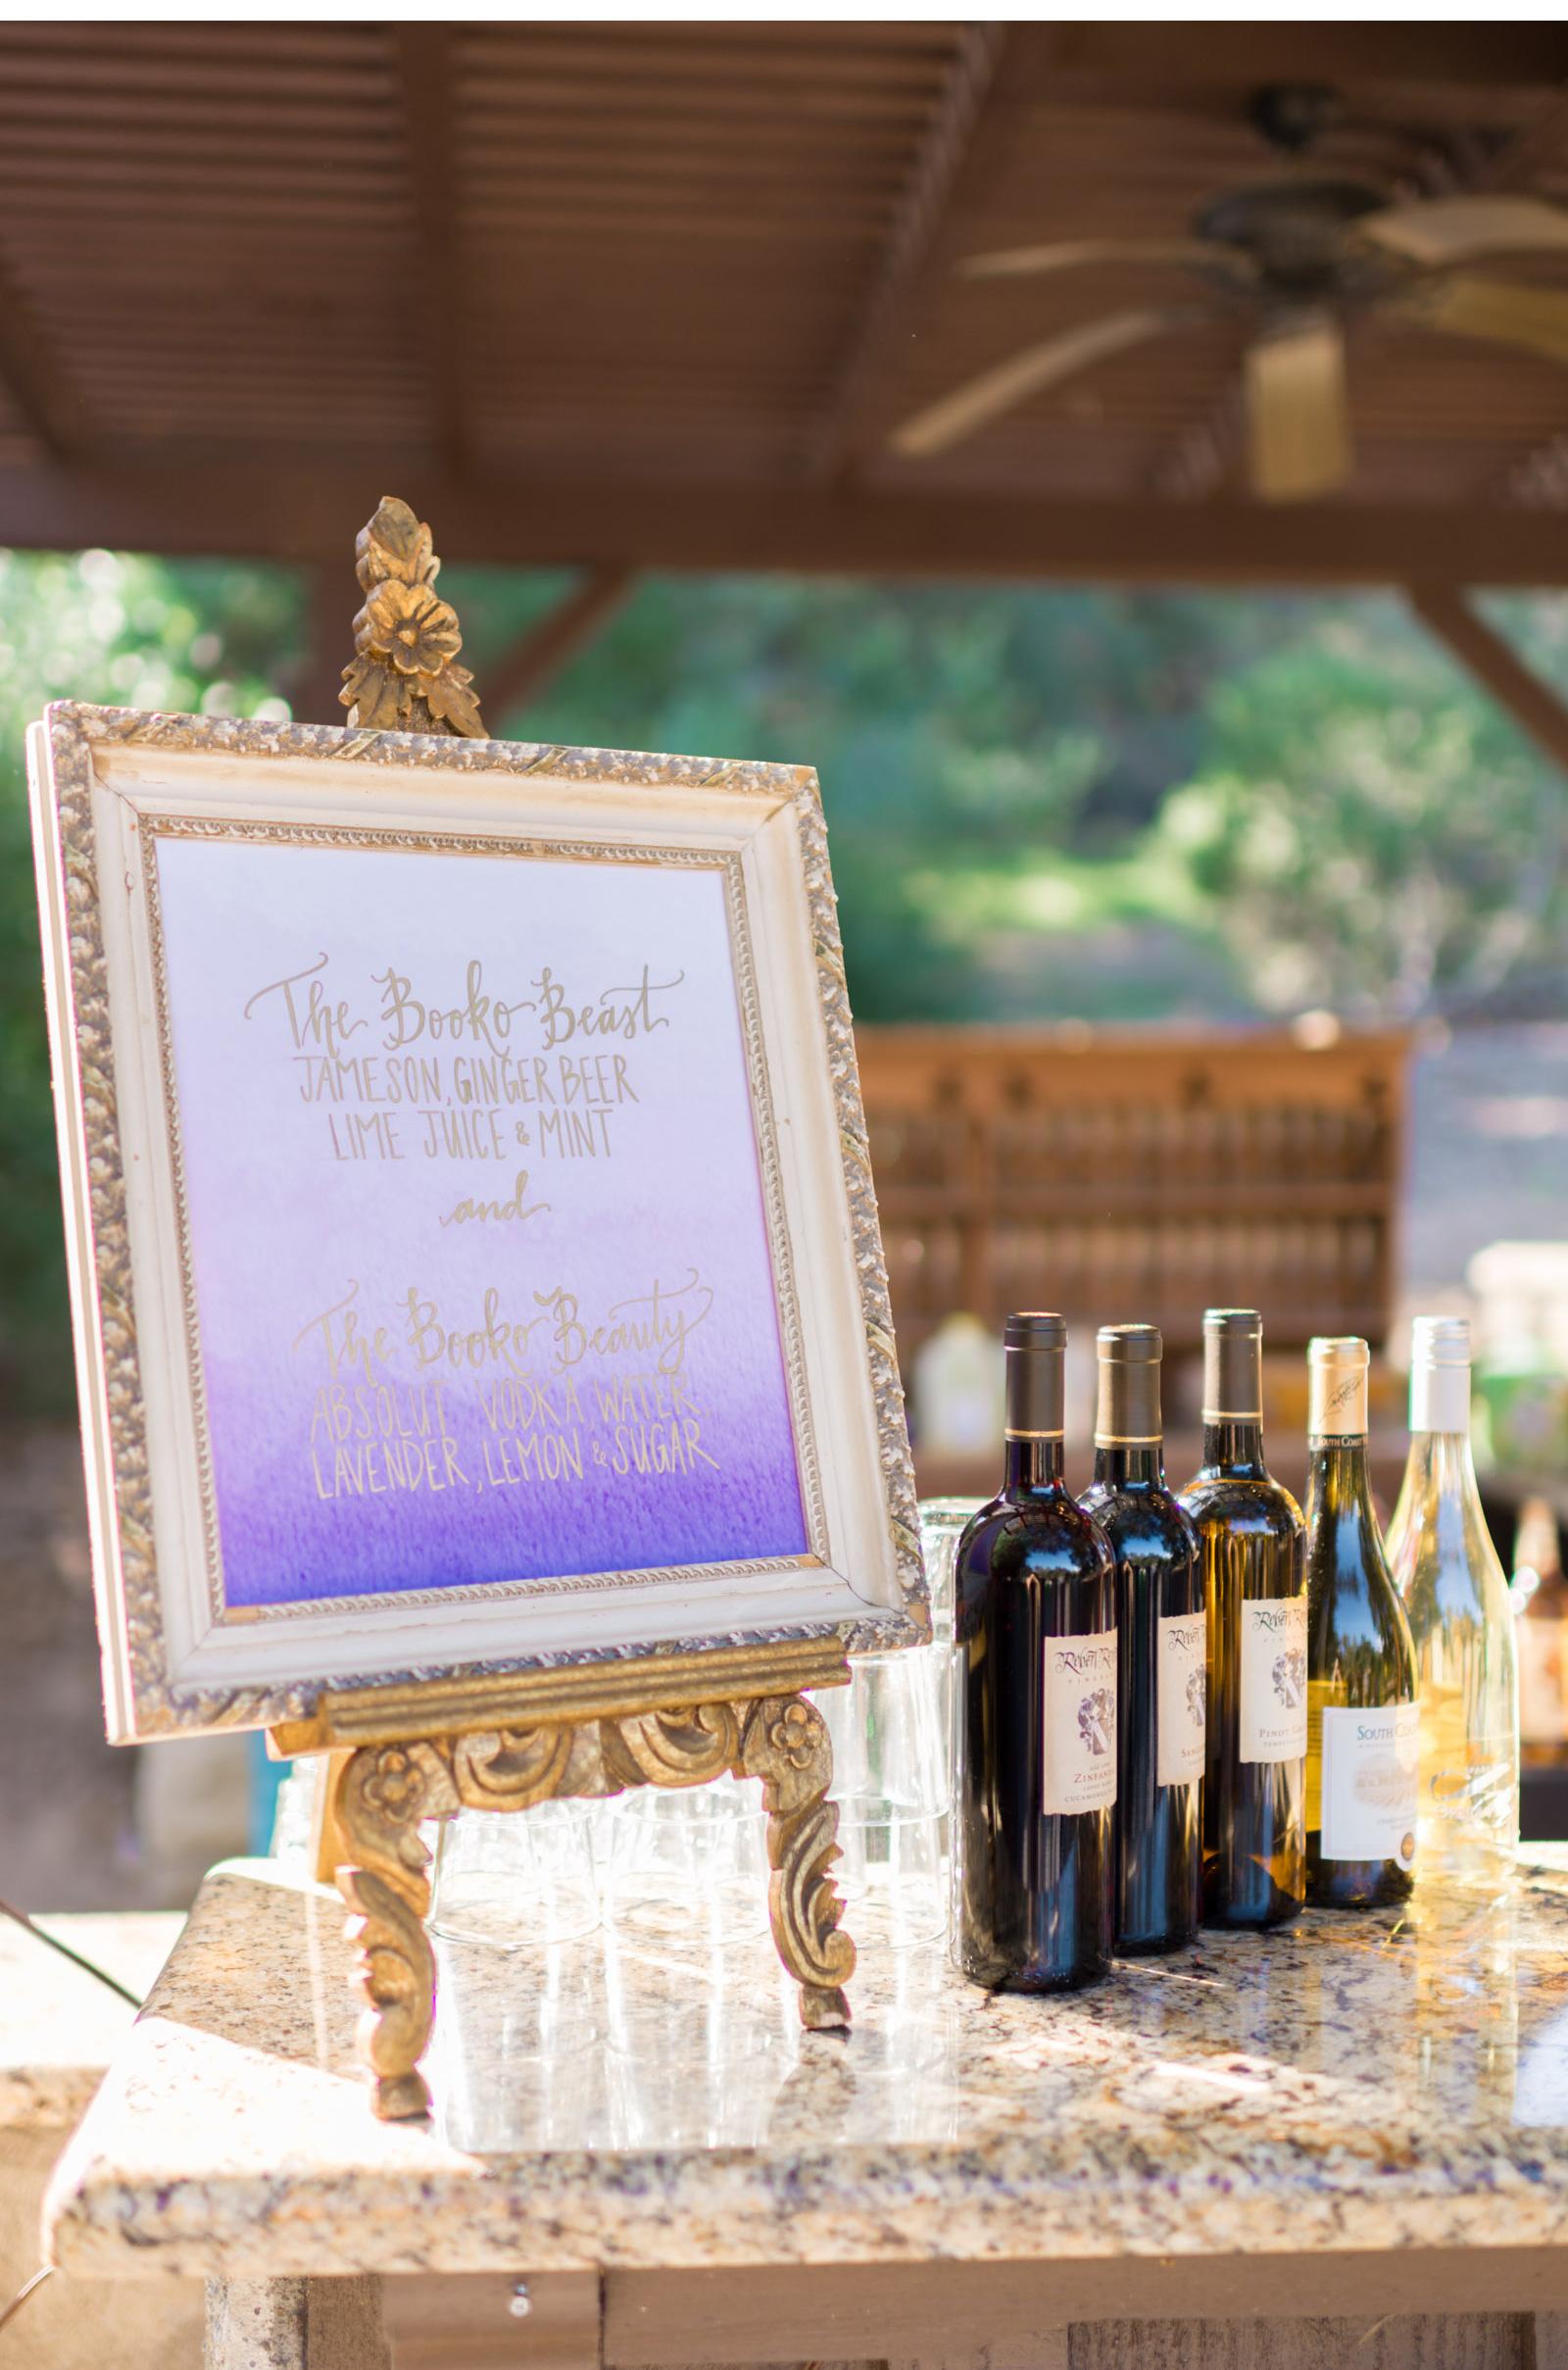 Nia-Sanchez-Wedding-First-Touch-Prayer-Natalie-Schutt-Photography_01.jpg